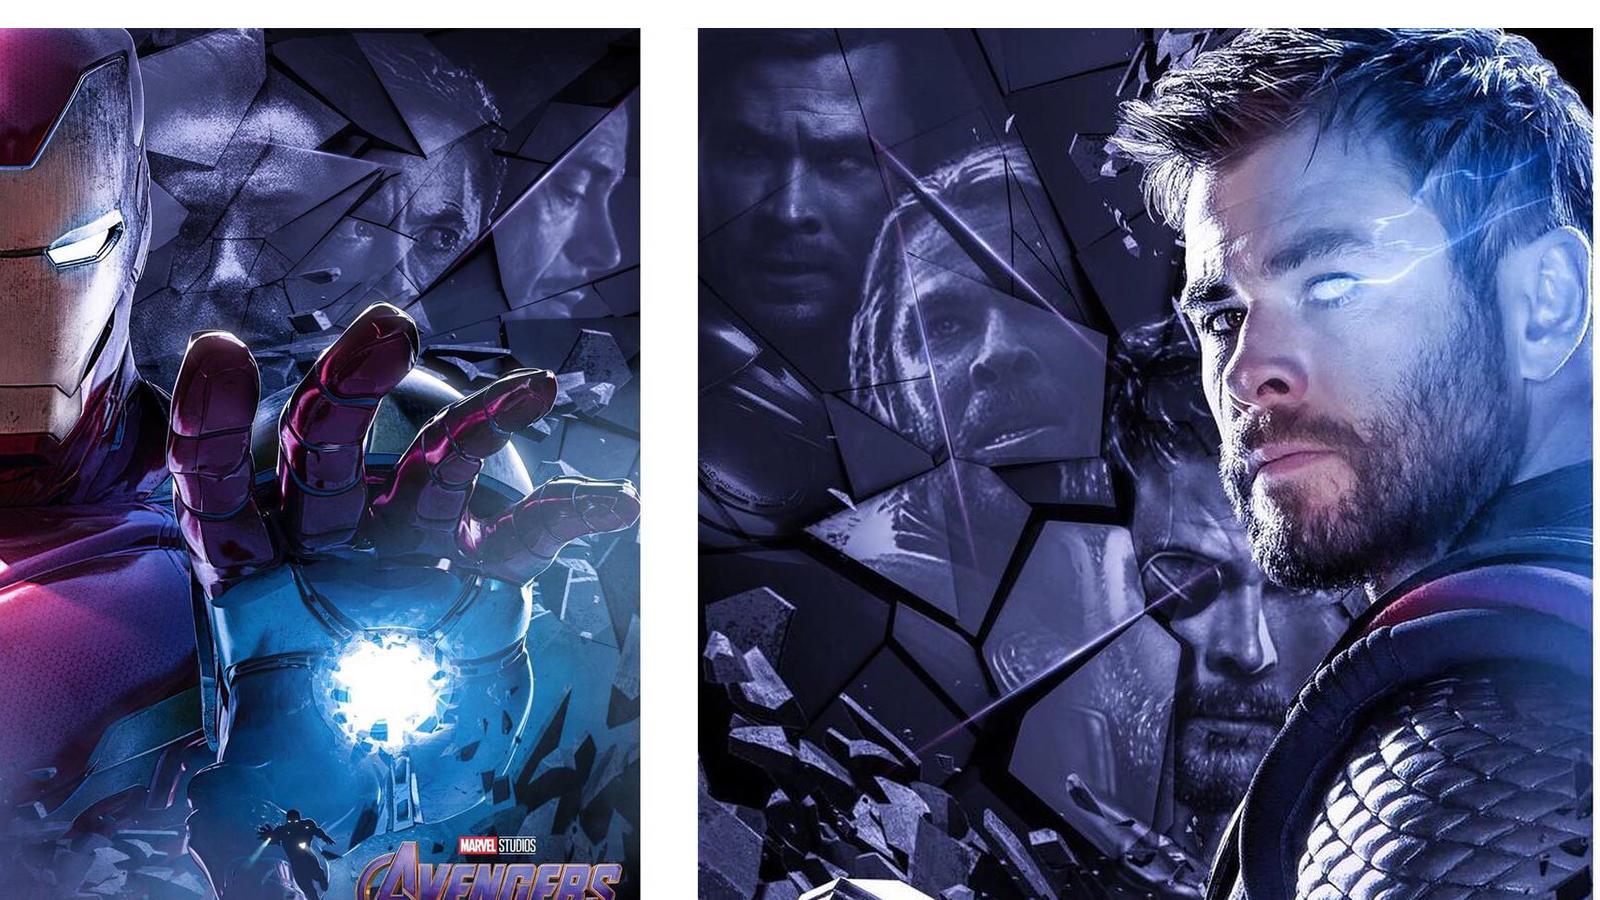 James Cameron congratulates 'Avengers: Endgame' for beating 'Avatar' at box-office